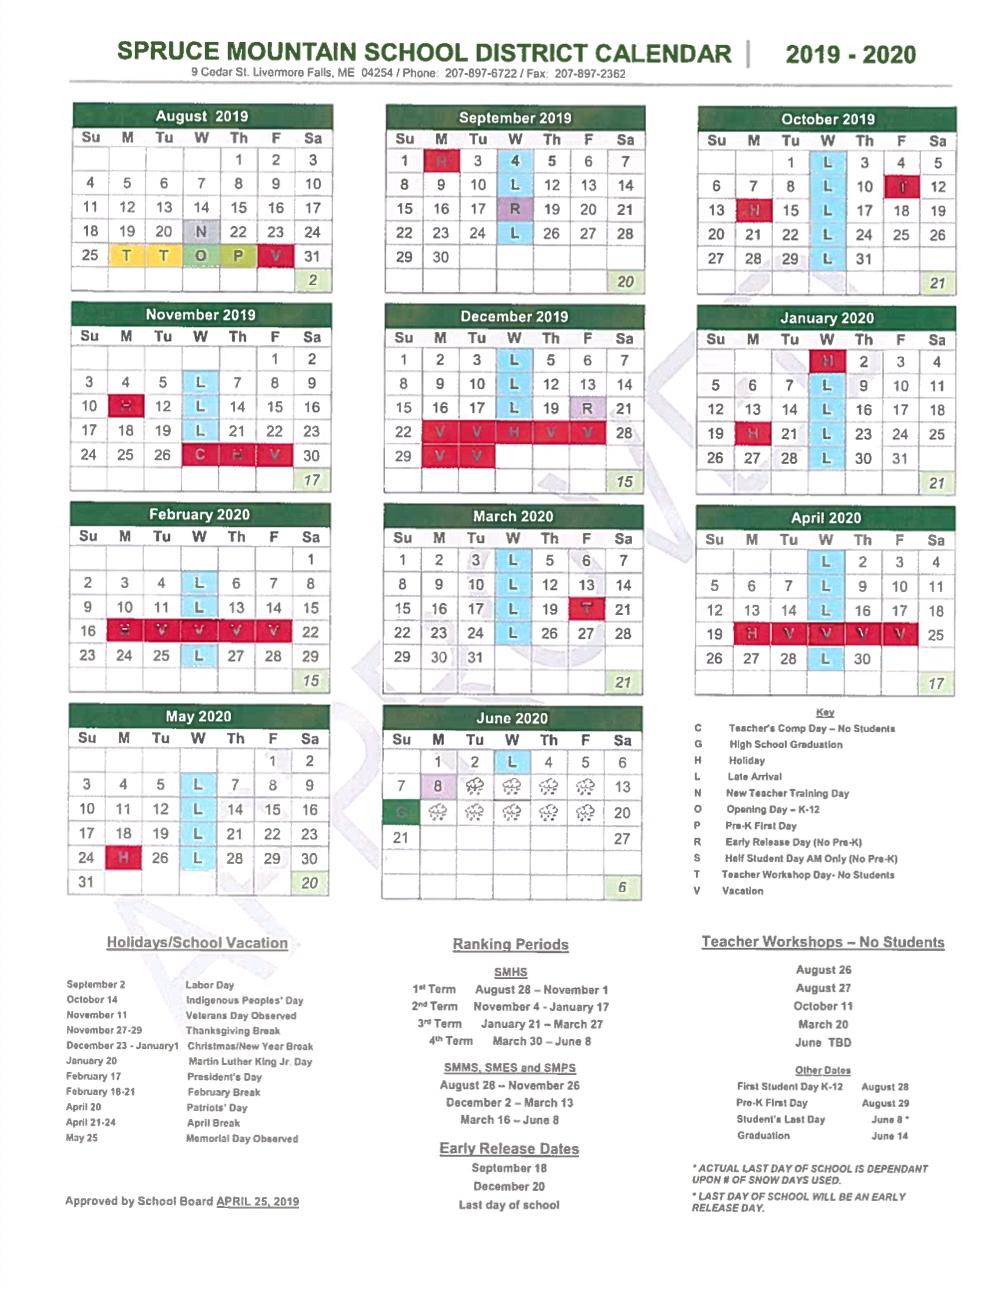 School Year Calendar - Spruce Mountain School District regarding Livermore School District Calander